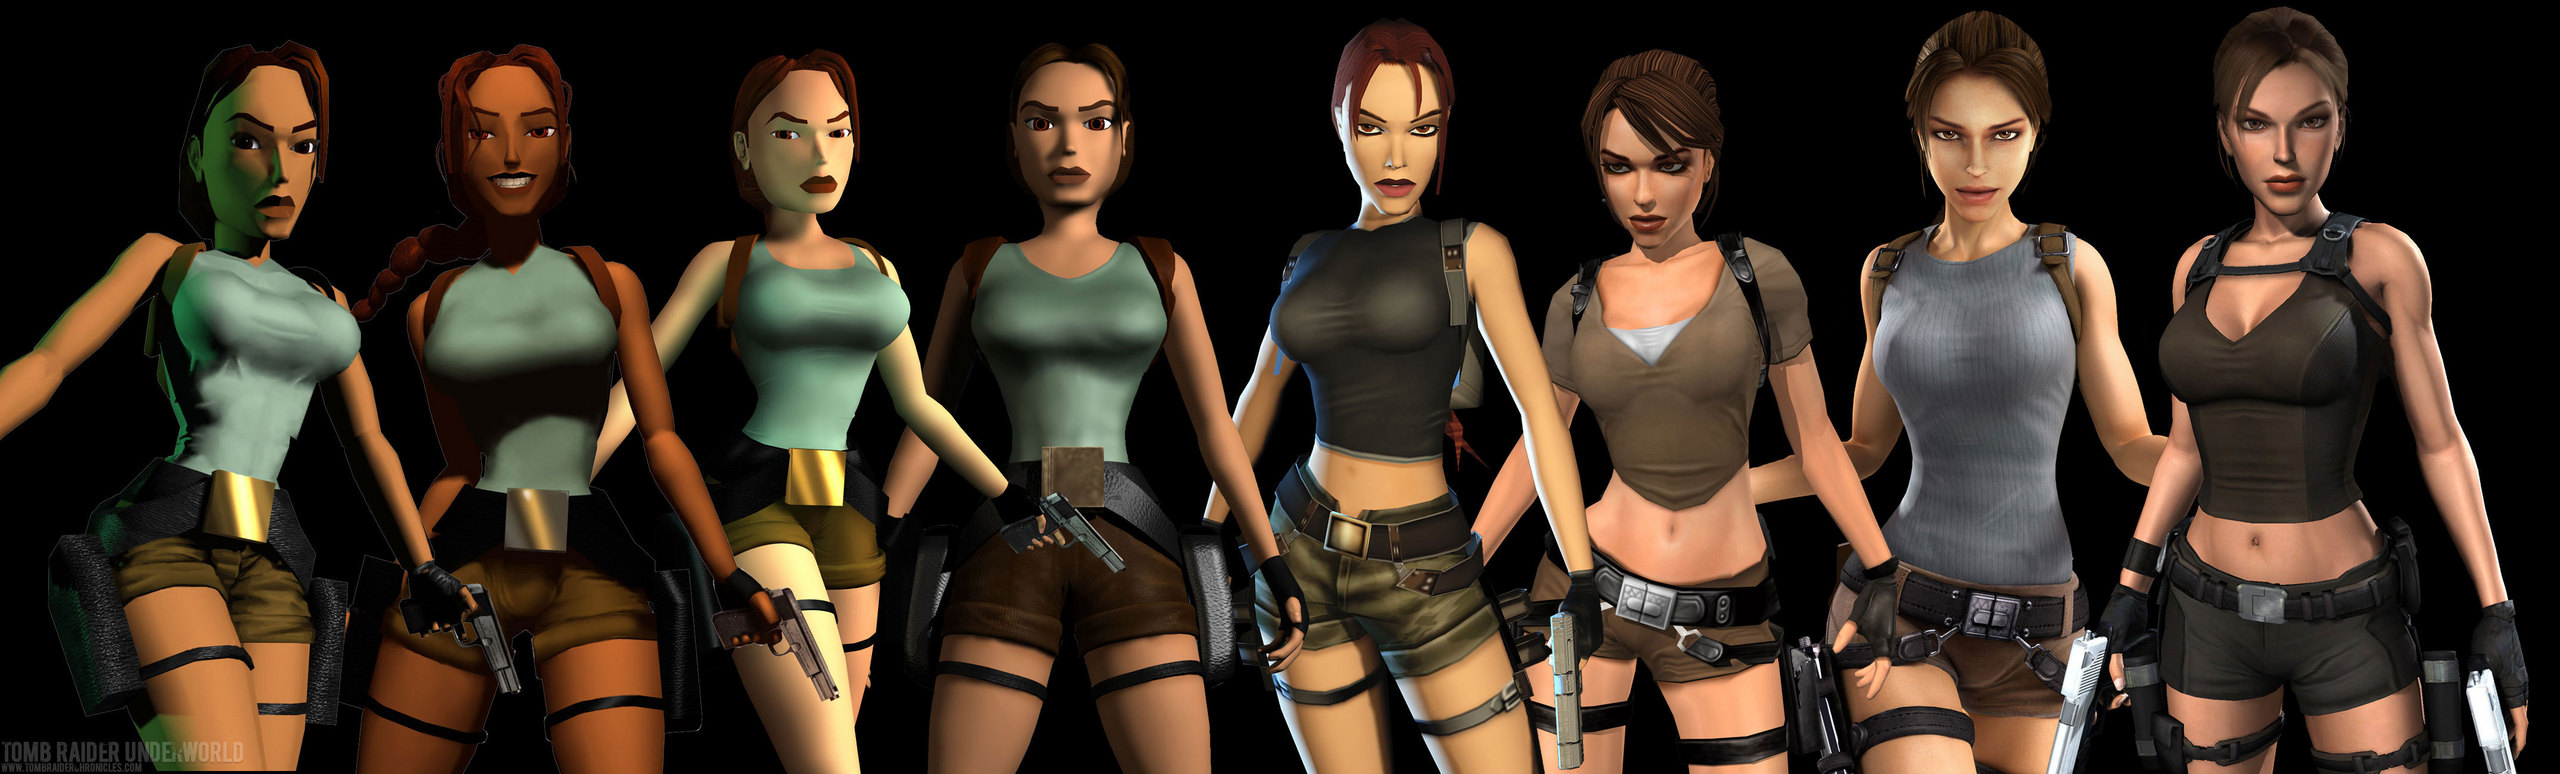 Lara-Croft-evolution-tomb-raider